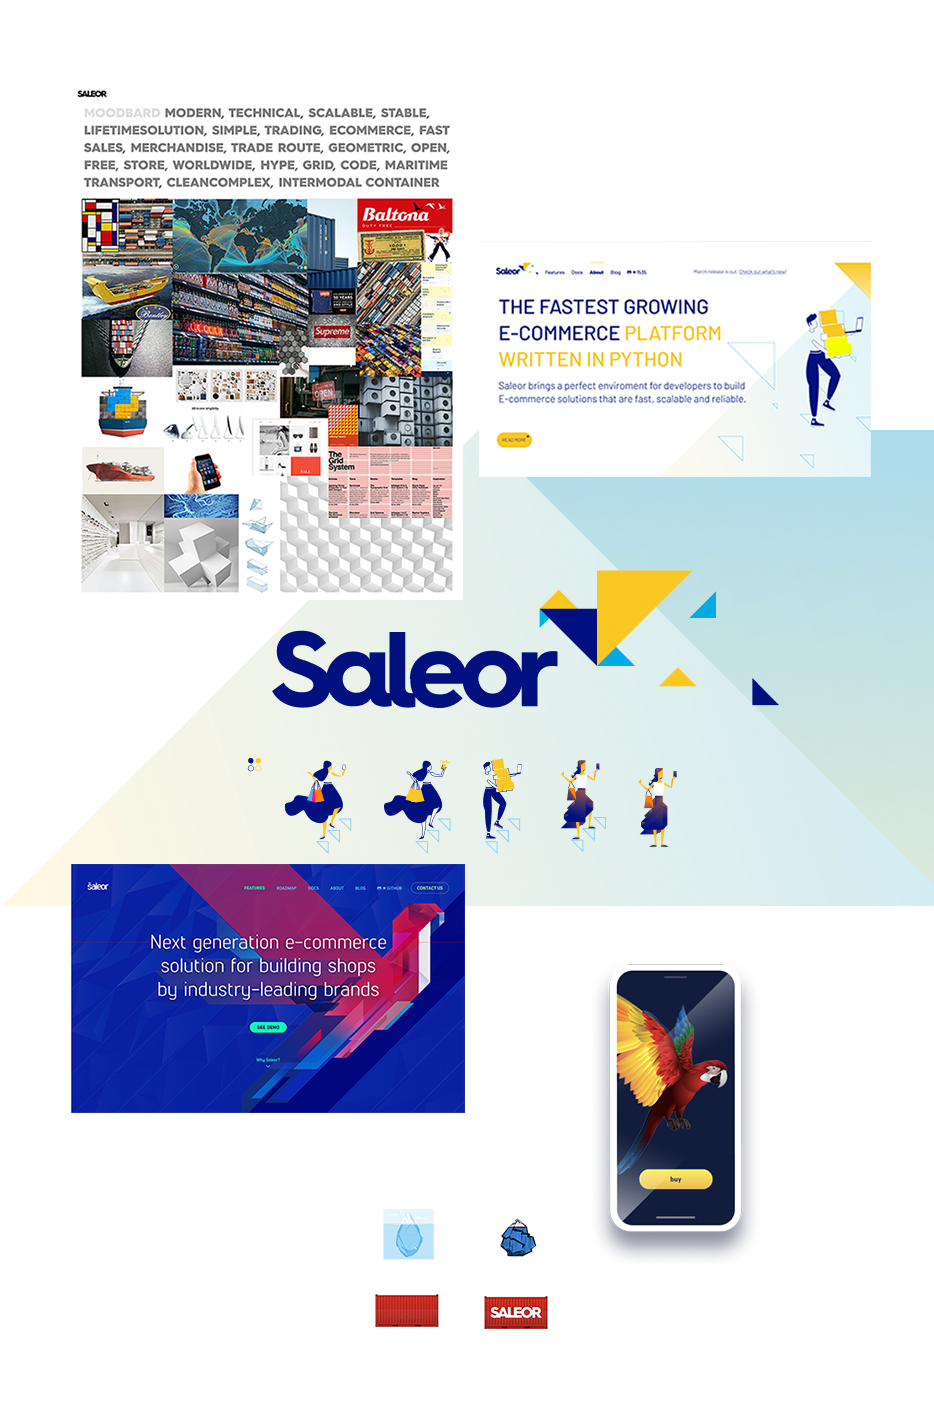 design graphicdesign Webdevelopment webdesigner marketing   Web digitalmarketing websitedesign product branding